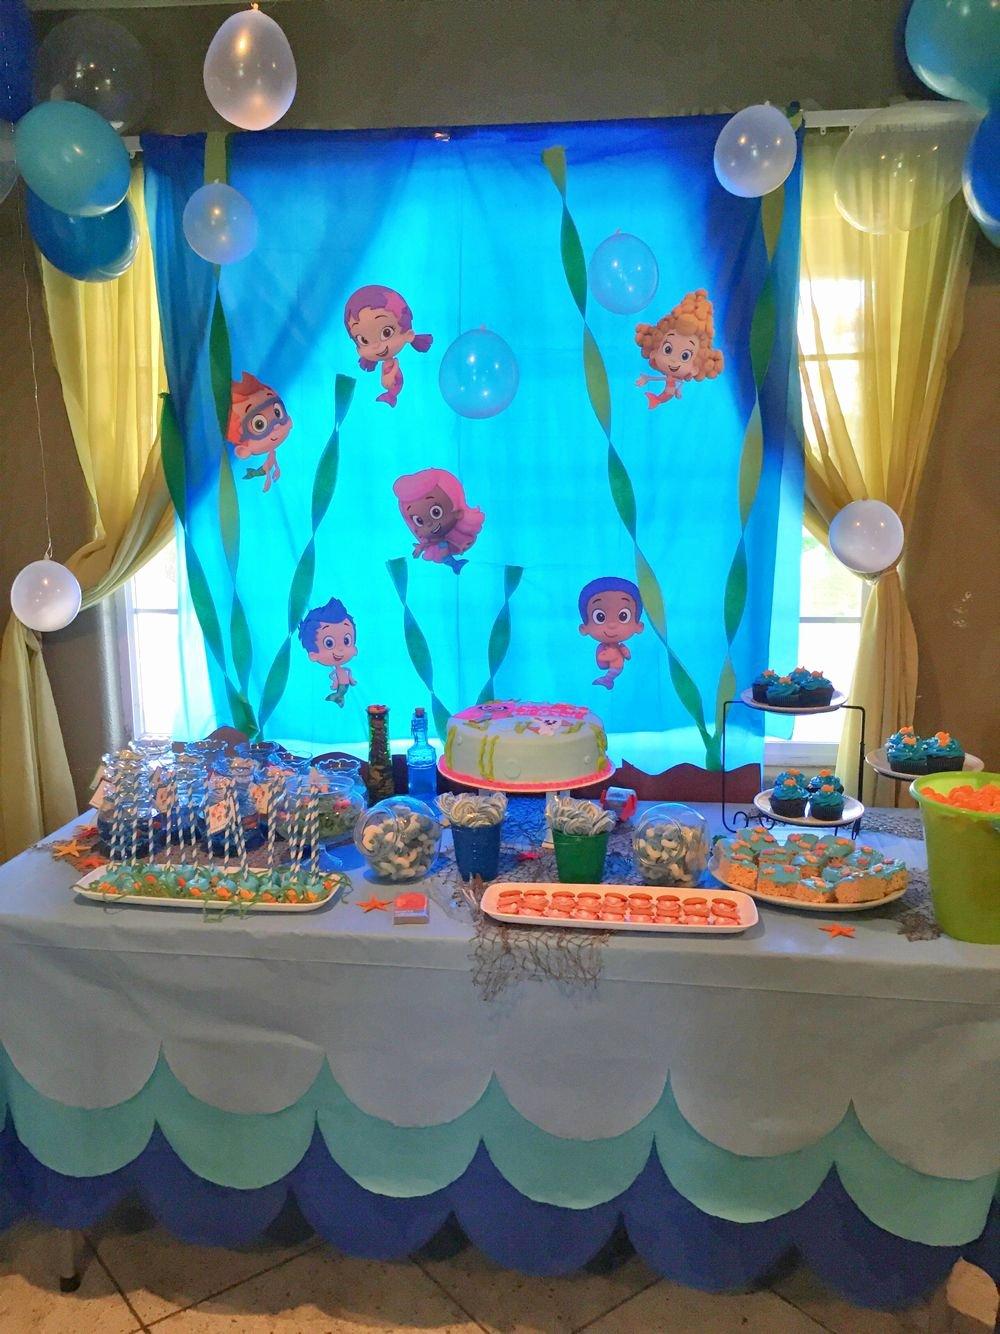 Bubble Guppies Birthday Decoration Ideas New Bubble Guppies Birthday Party Decorations